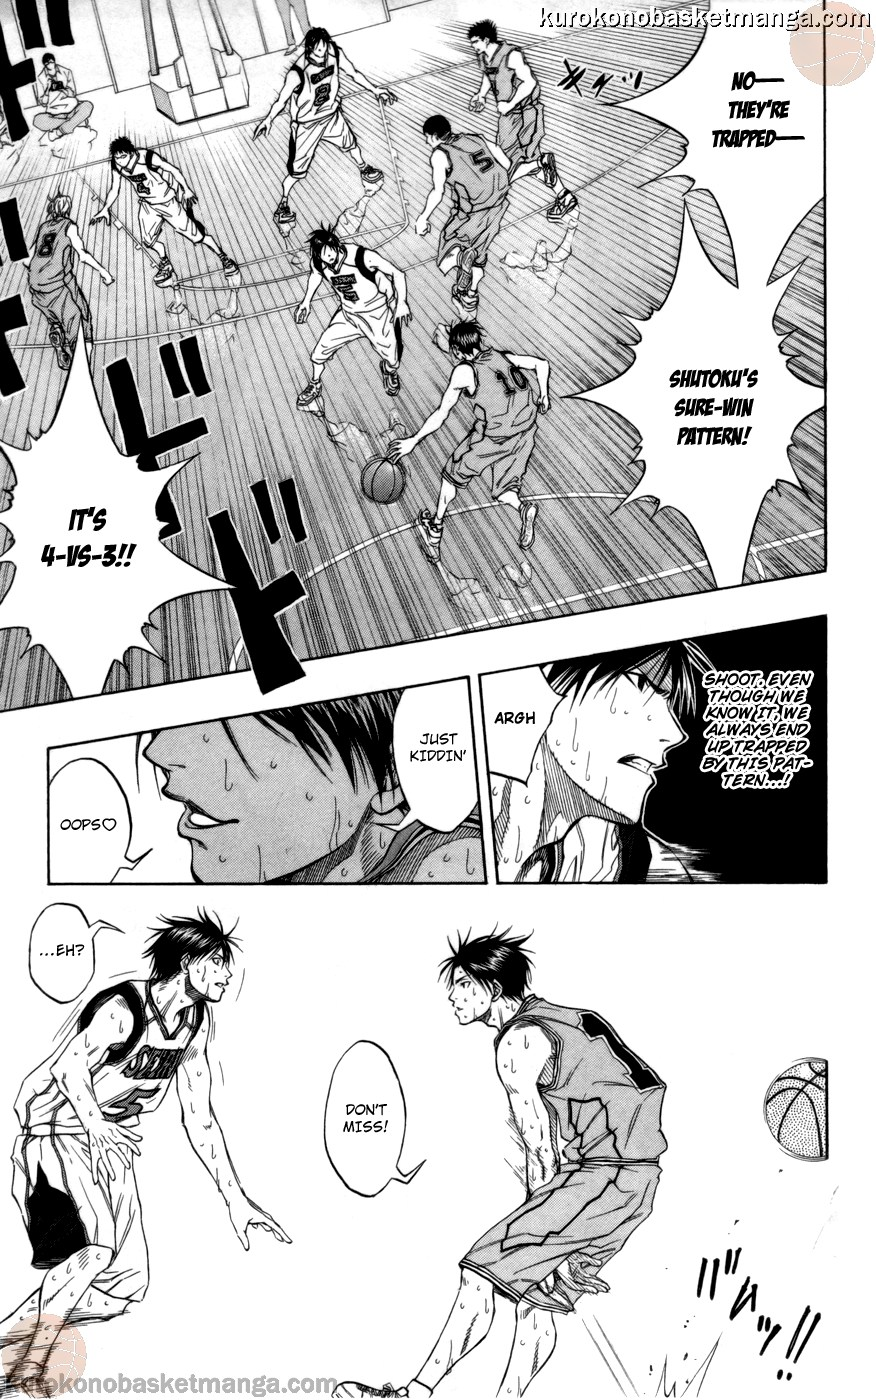 Kuroko no Basket Manga Chapter 89 - Image 05